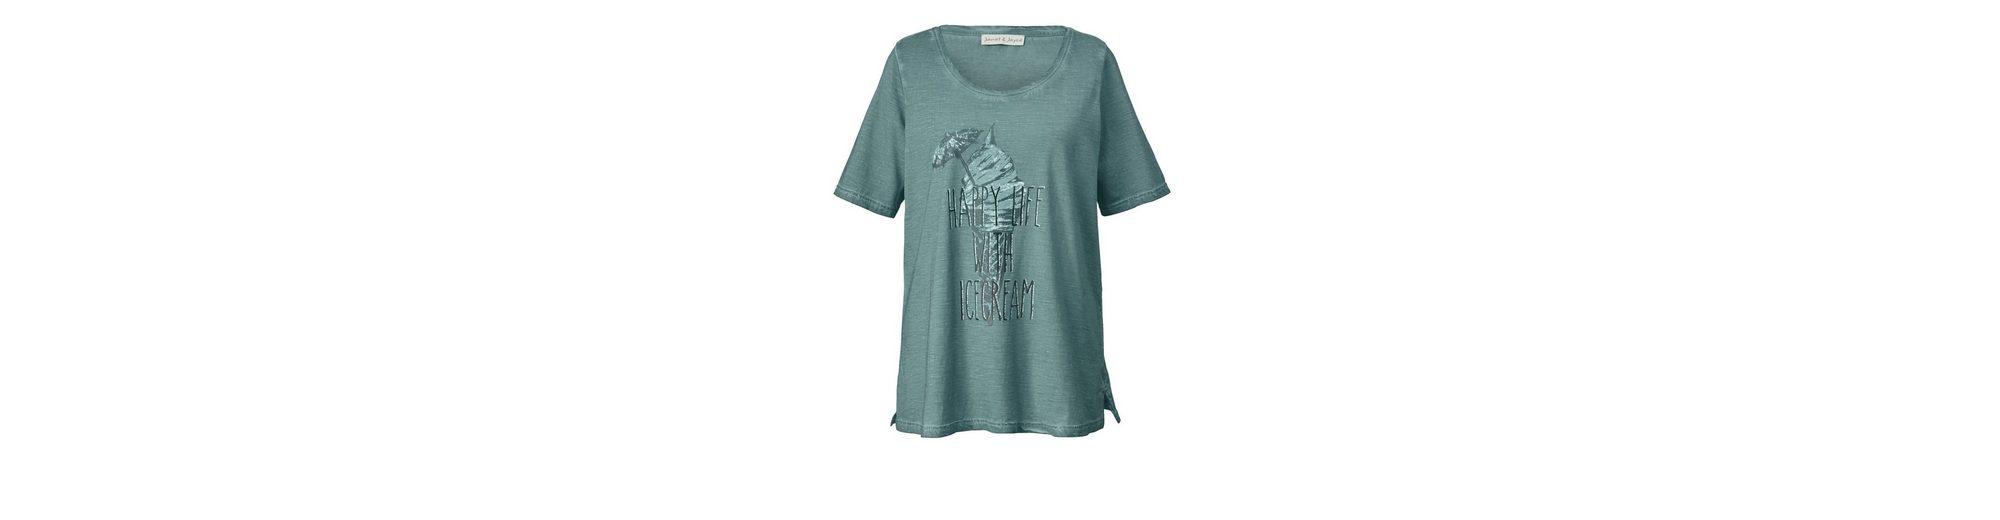 Janet und Joyce by Happy Size Shirt oil wash Outlet Neuesten Kollektionen EBNMiP